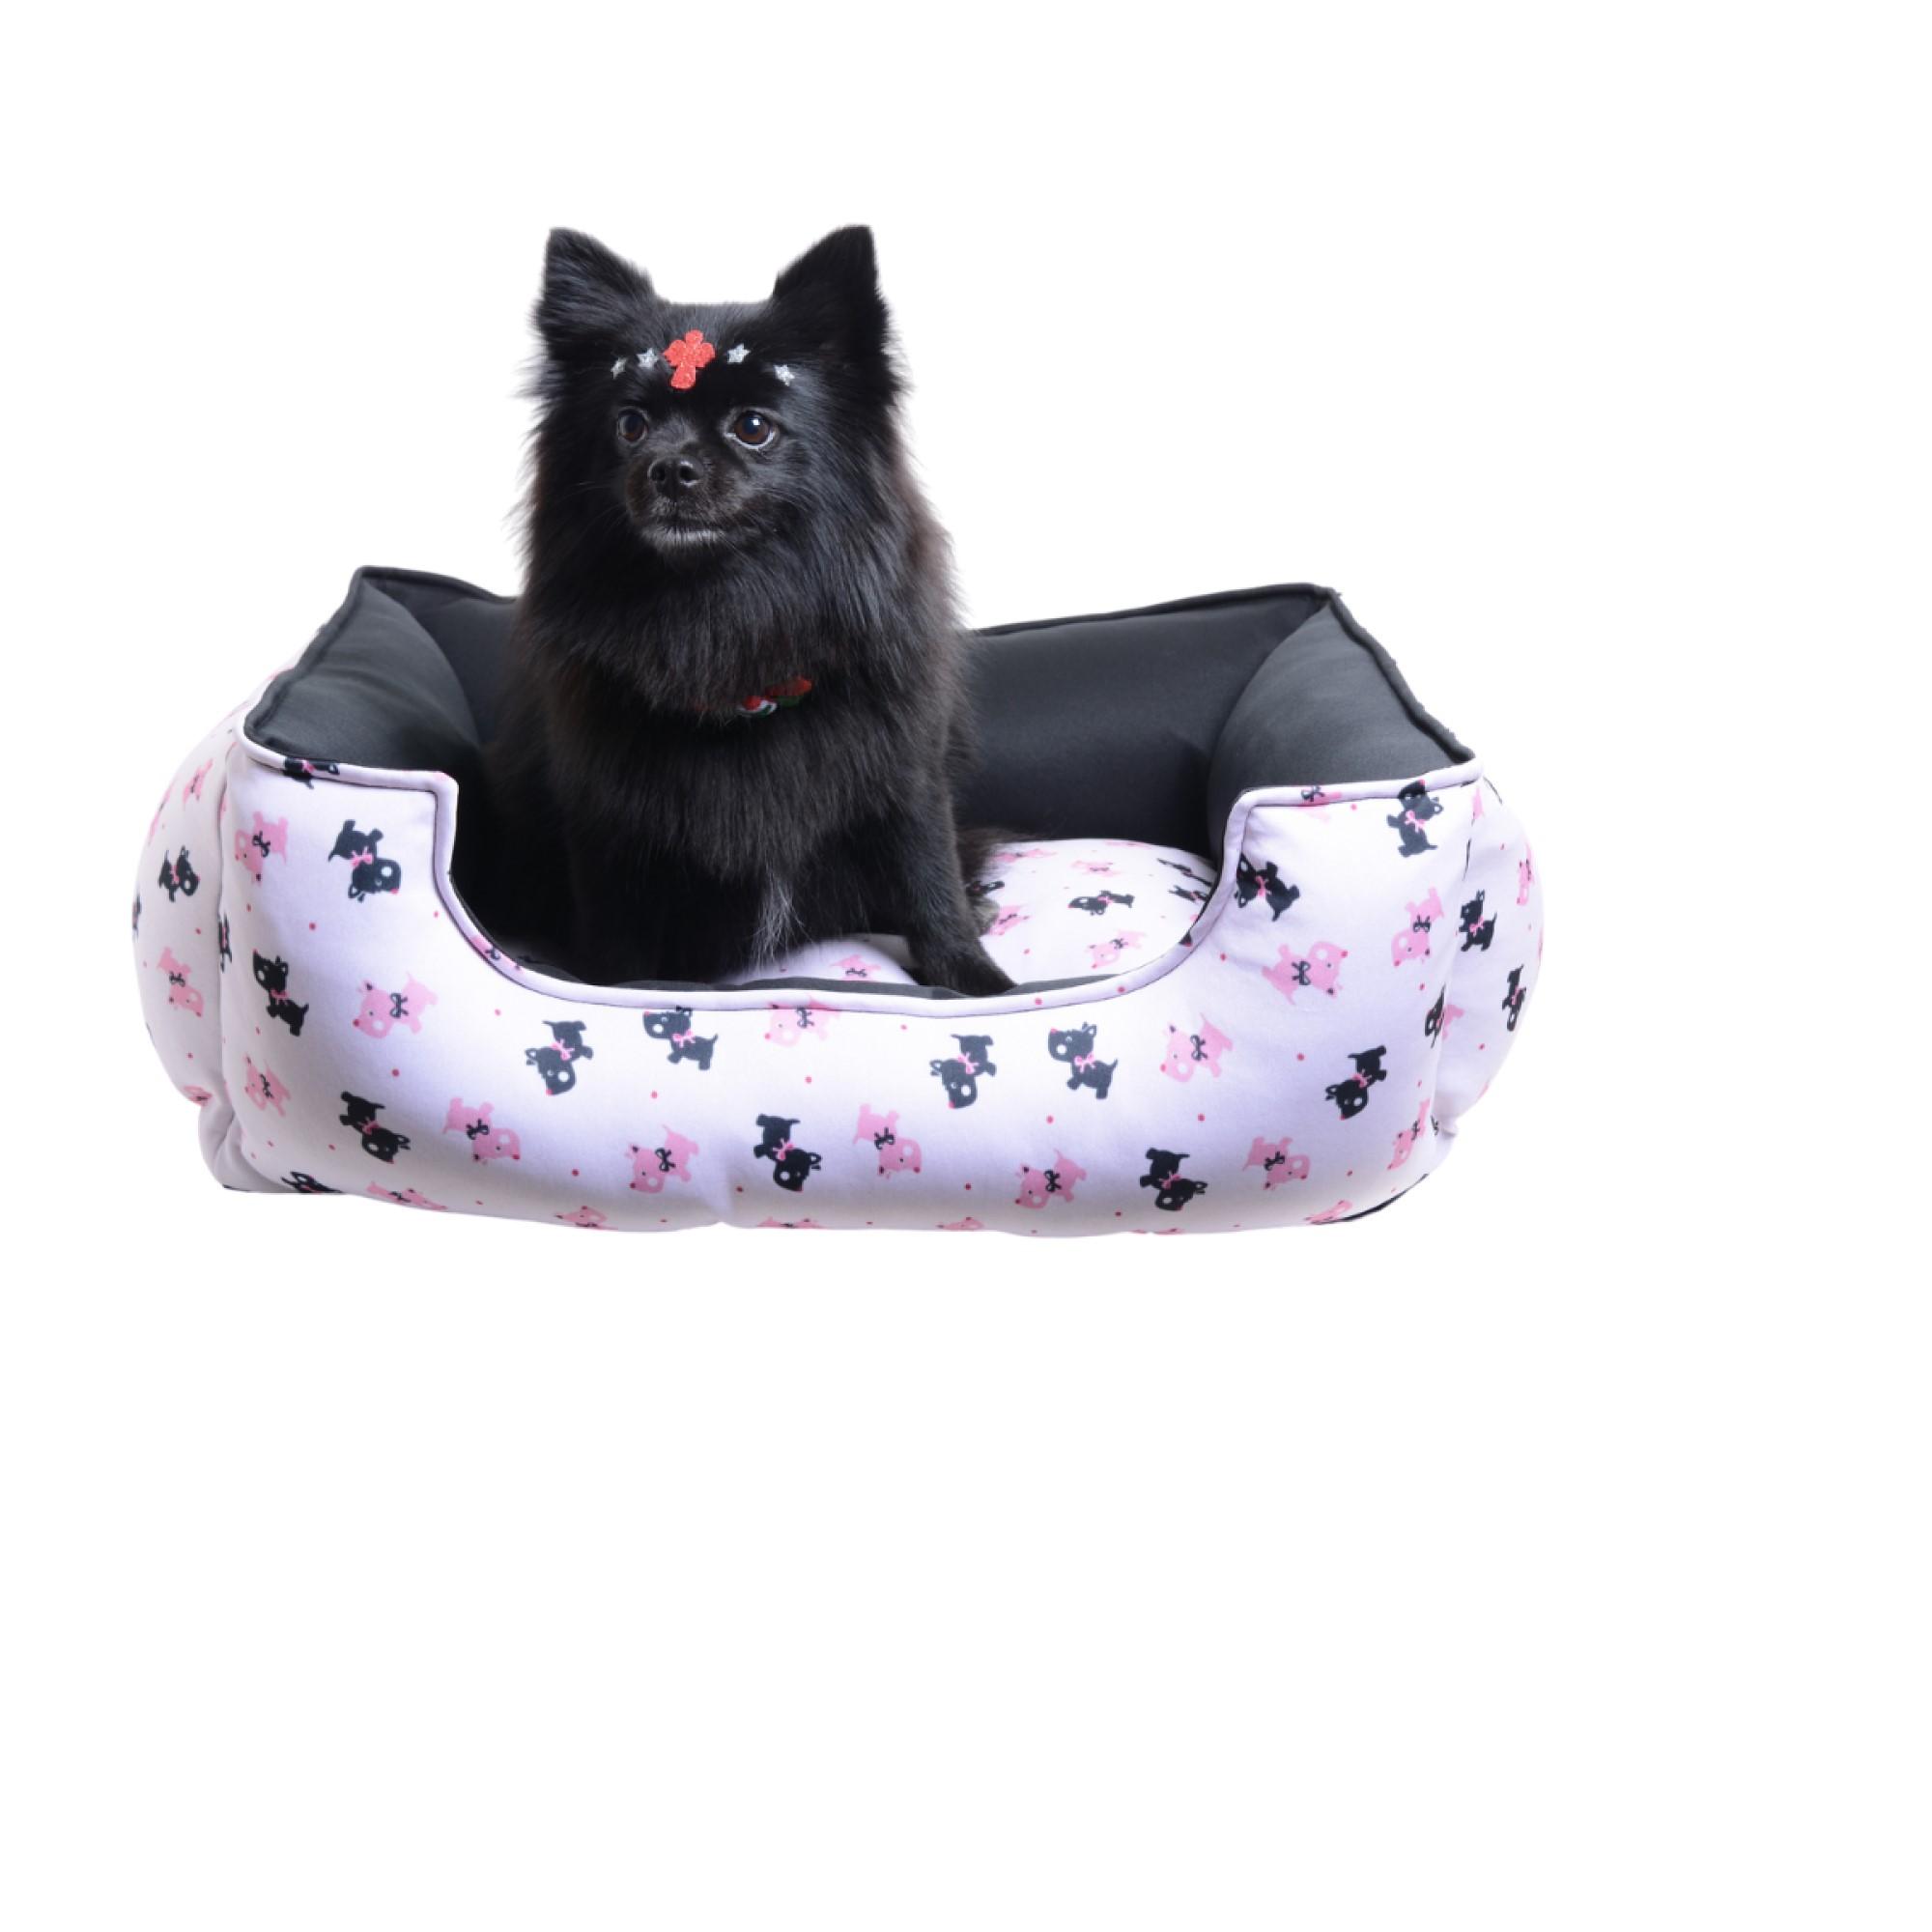 Cama para Cachorro Luxo Protect - Rosa